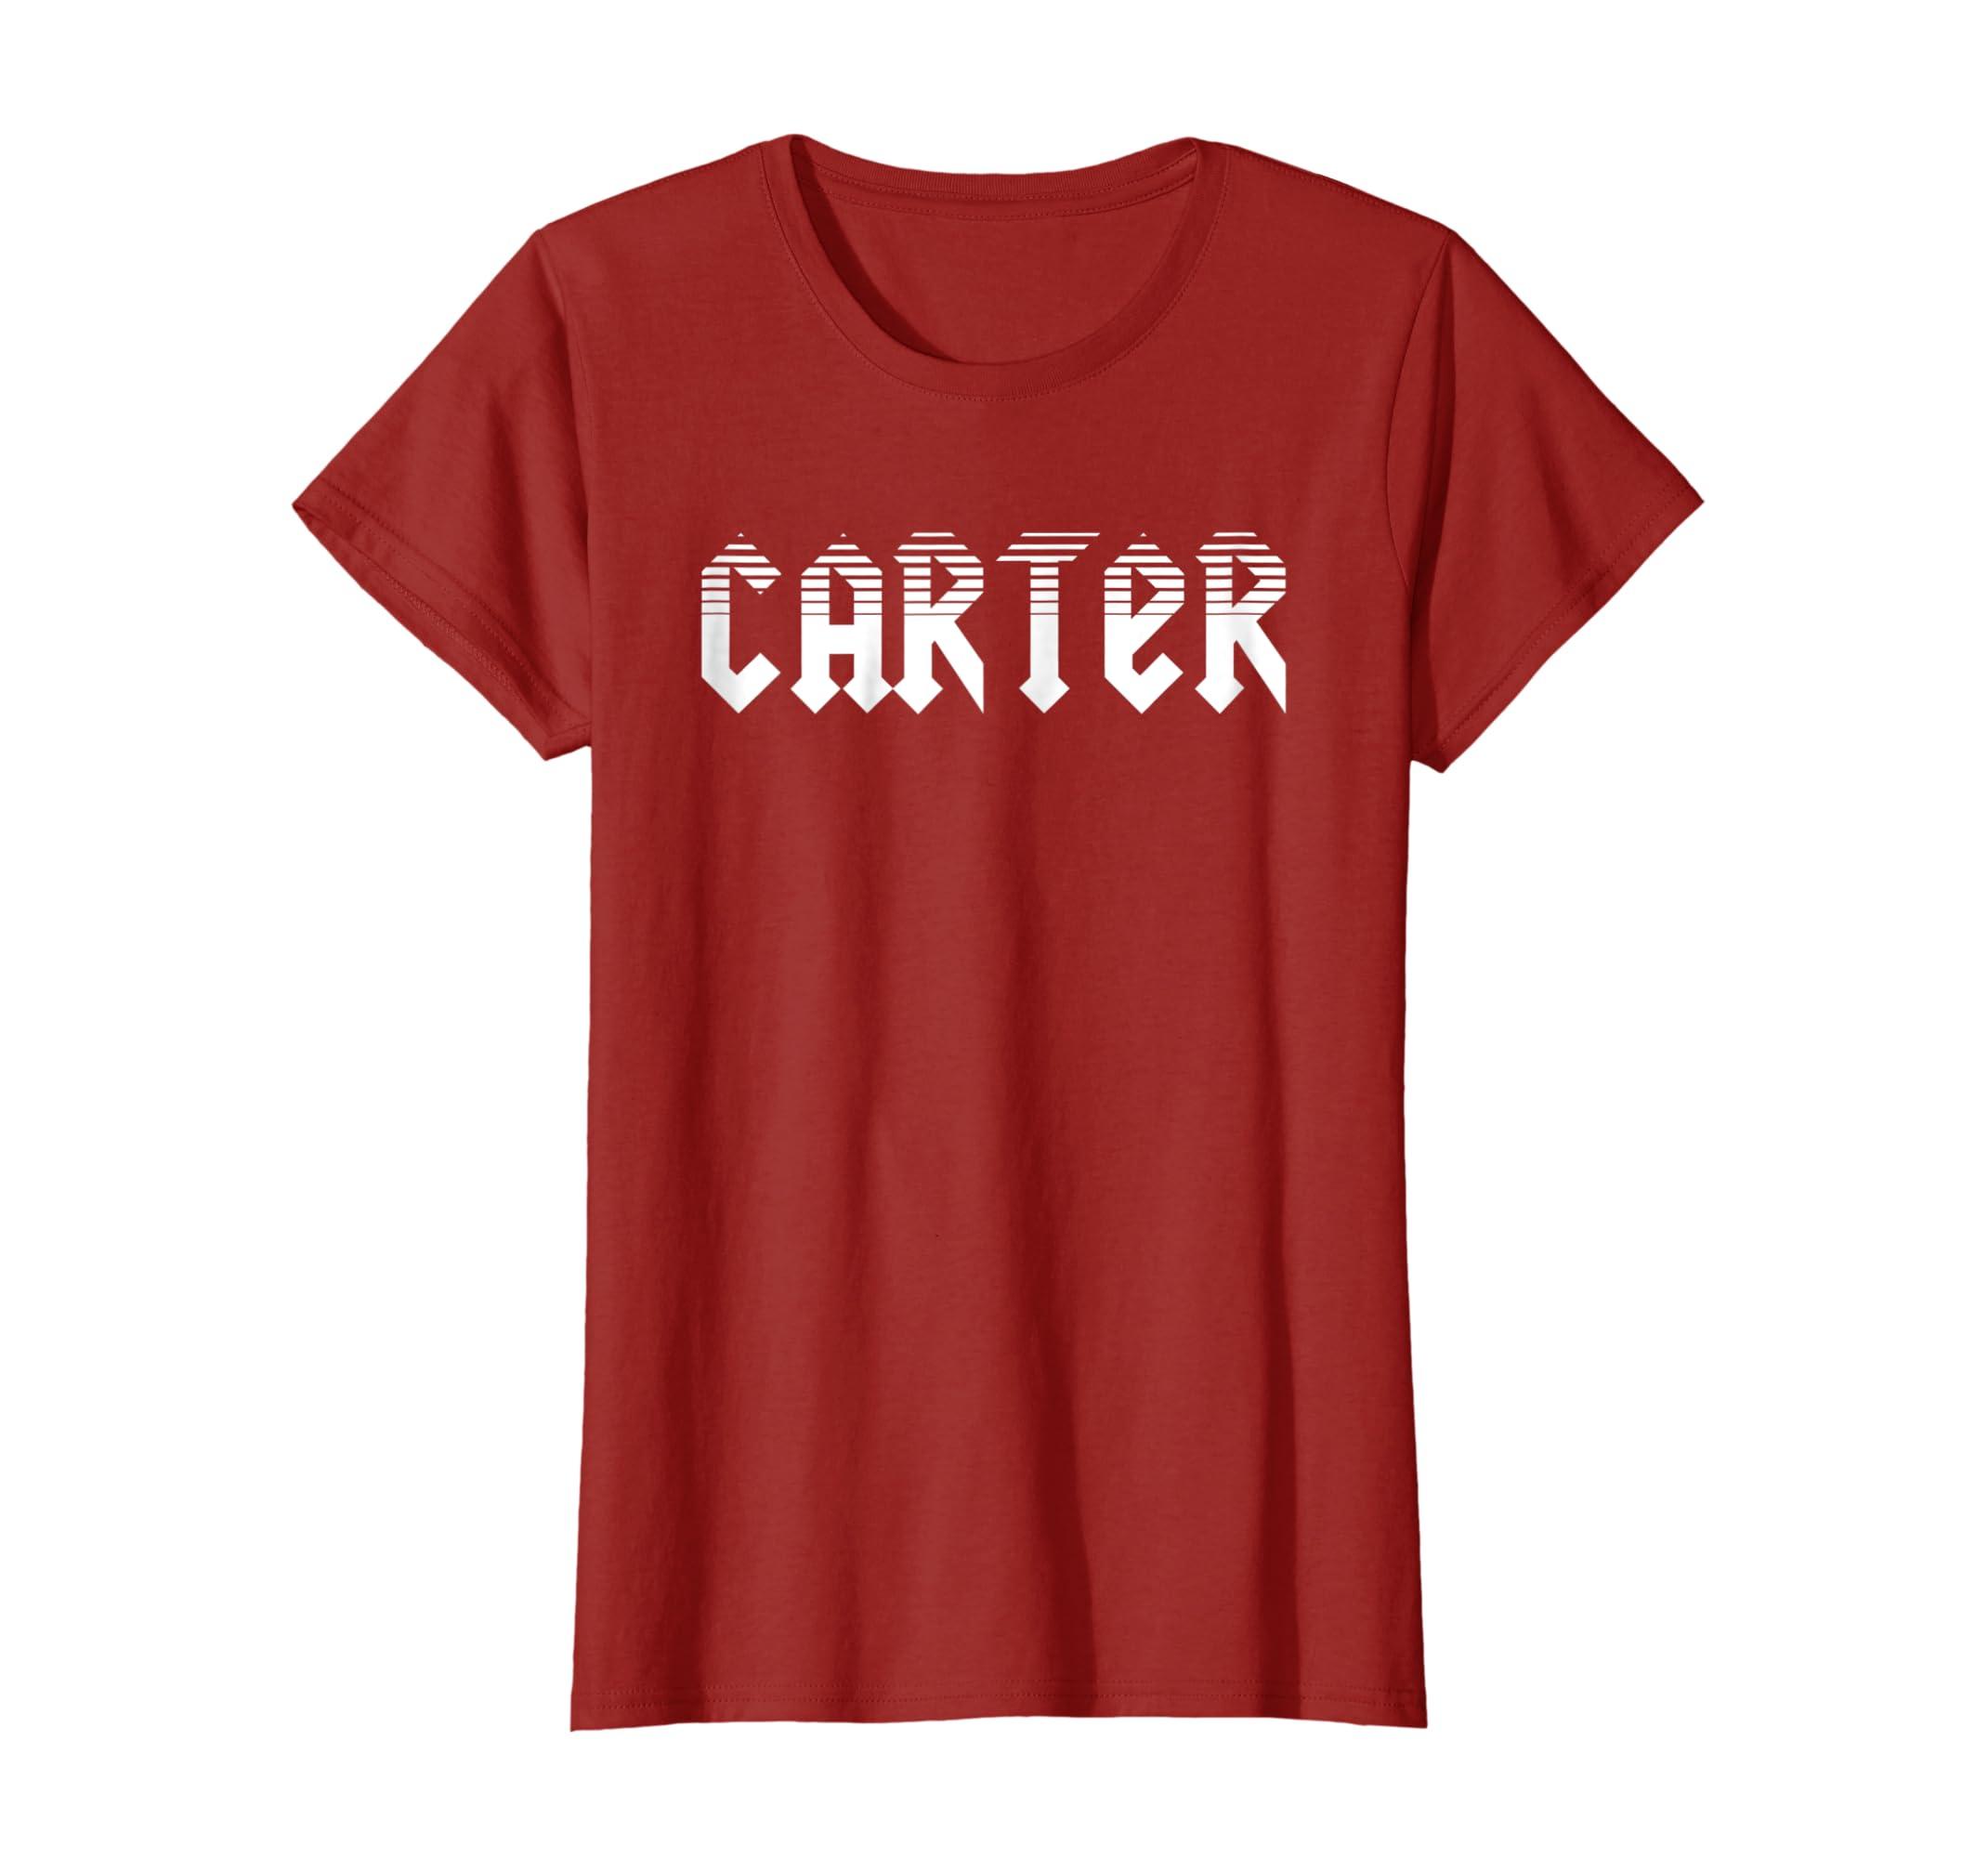 5b1ea7afb Amazon.com: Carter Sharer T-Shirt: Clothing